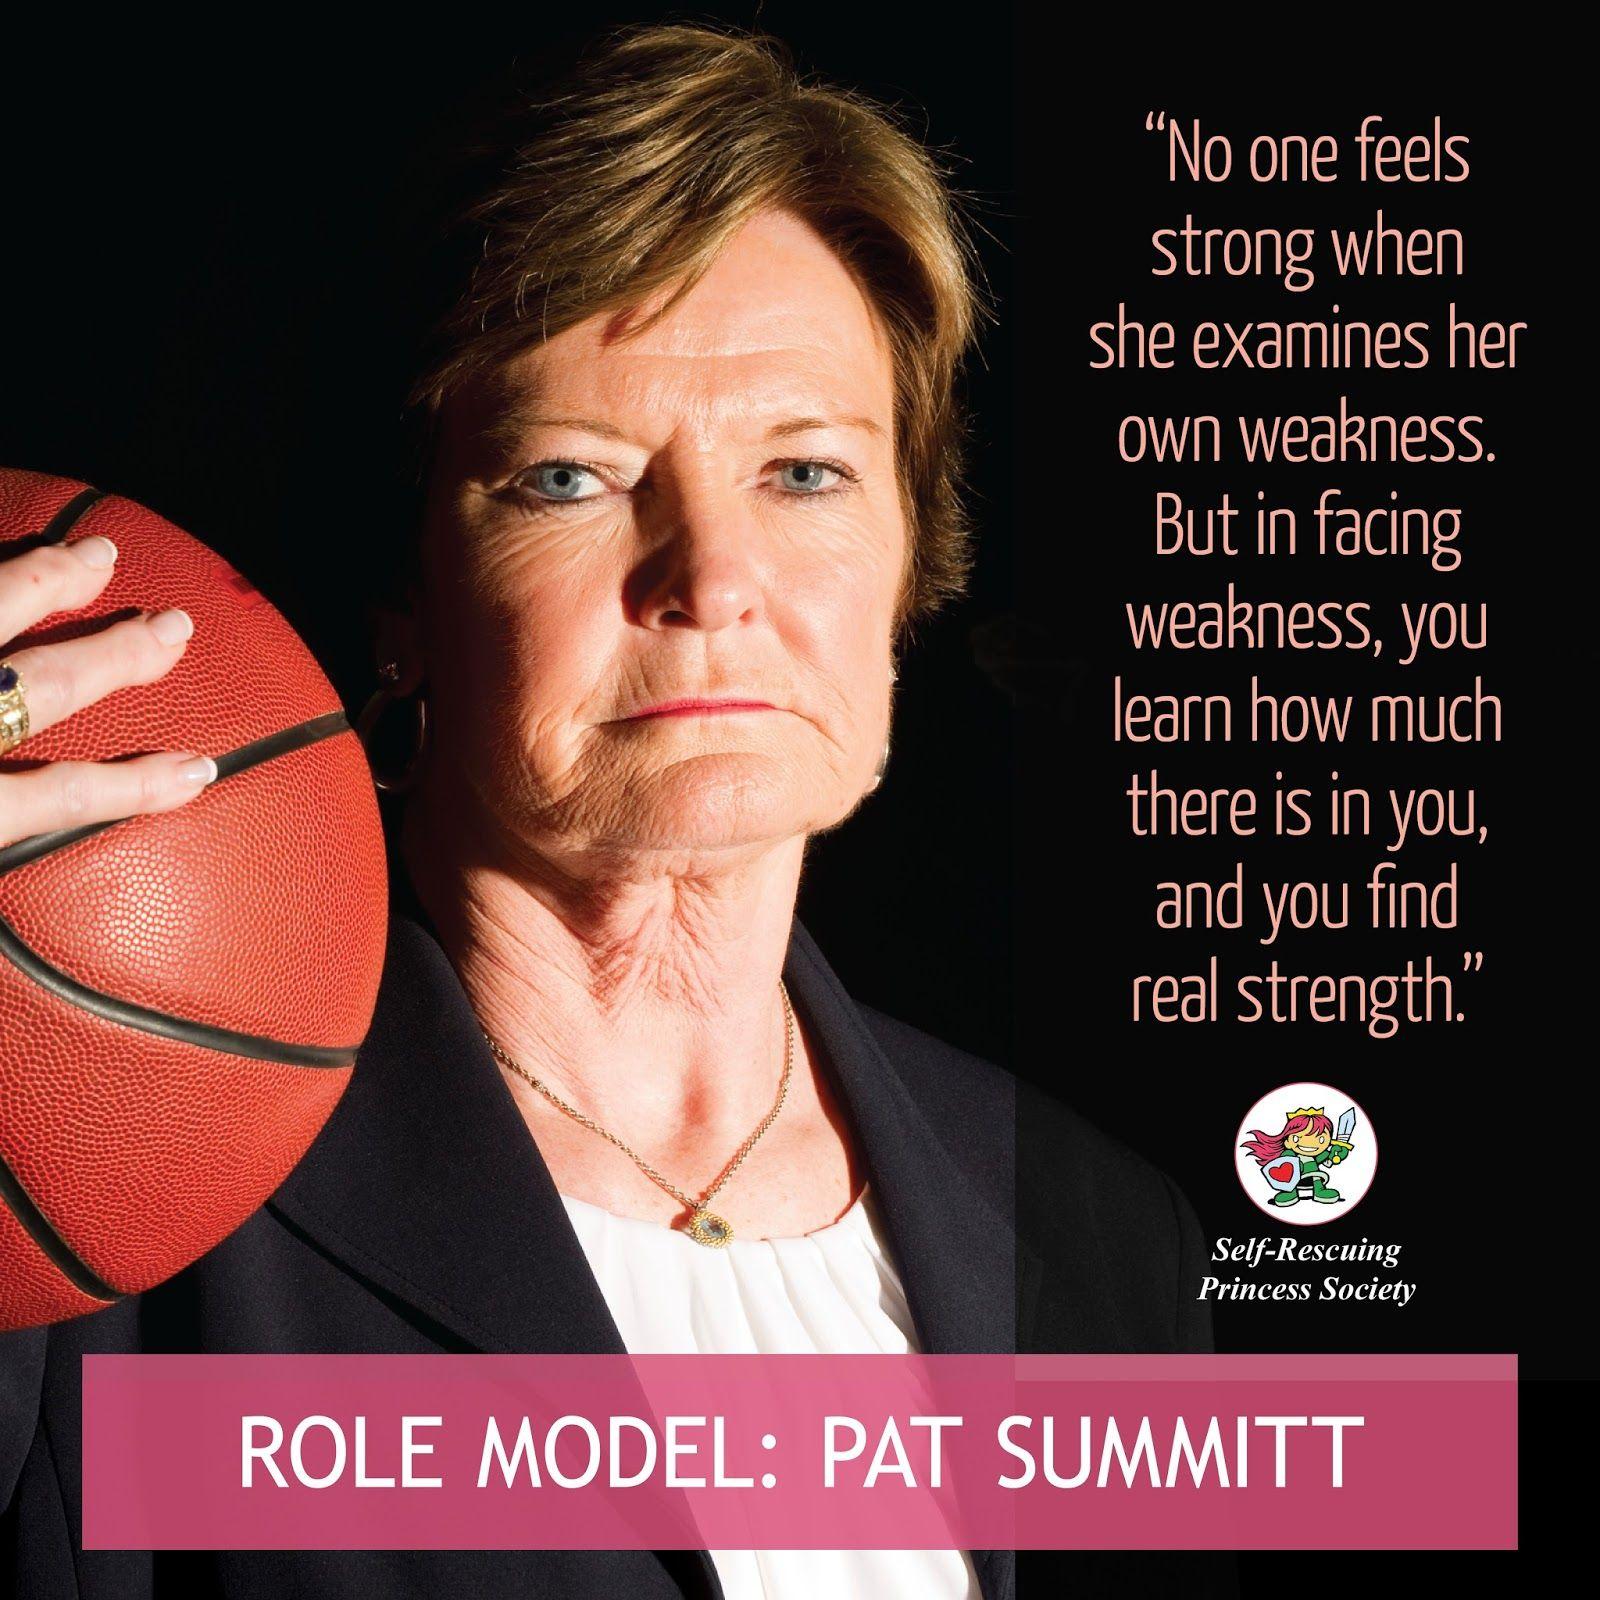 Pat Summitt Quotes: SRPS Role Model: Pat Summitt - Basketball Icon